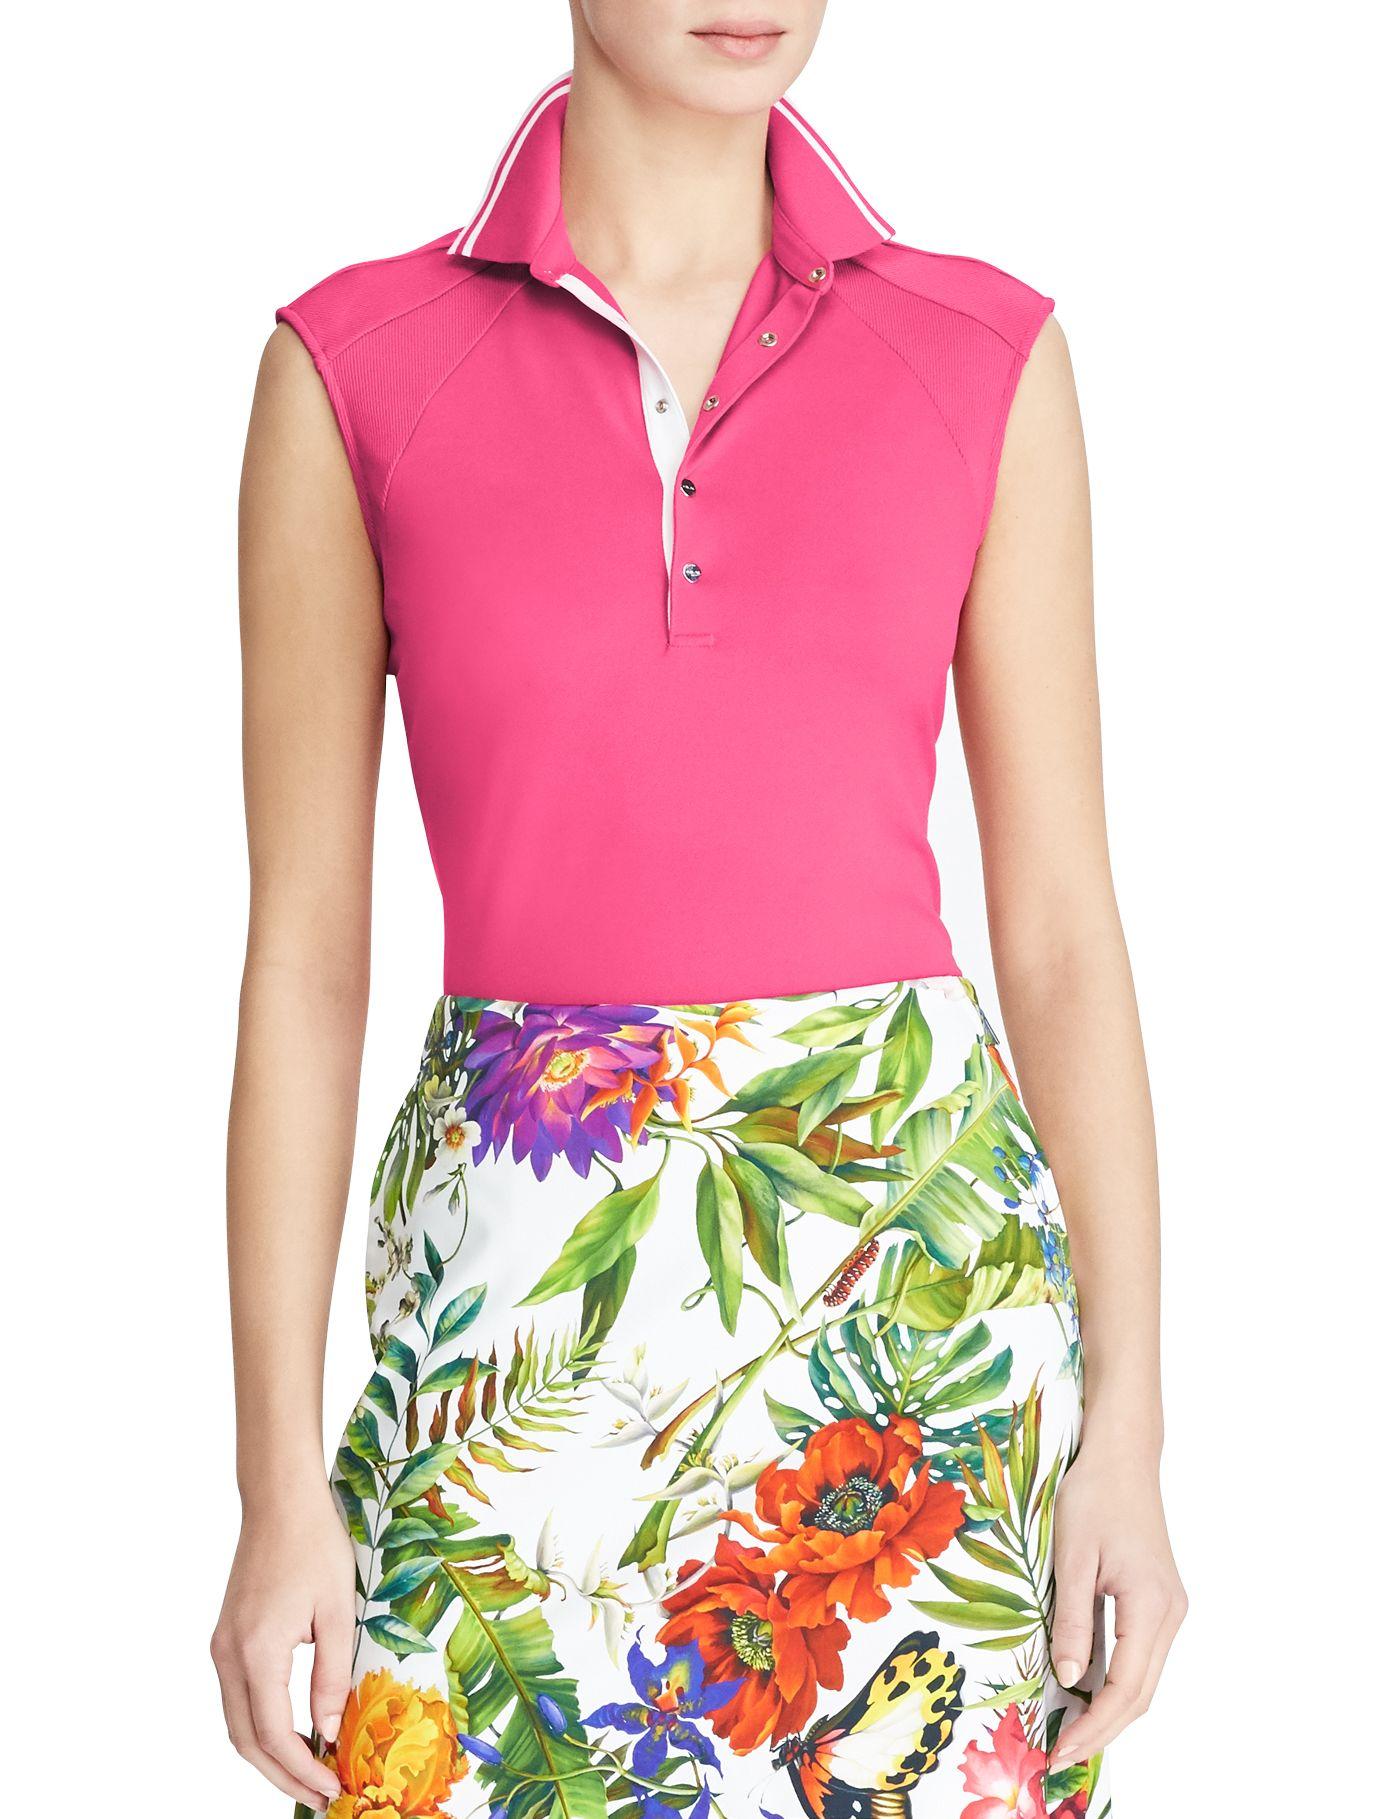 RLX Golf Women's Sleeveless Tailored Knit Golf Polo